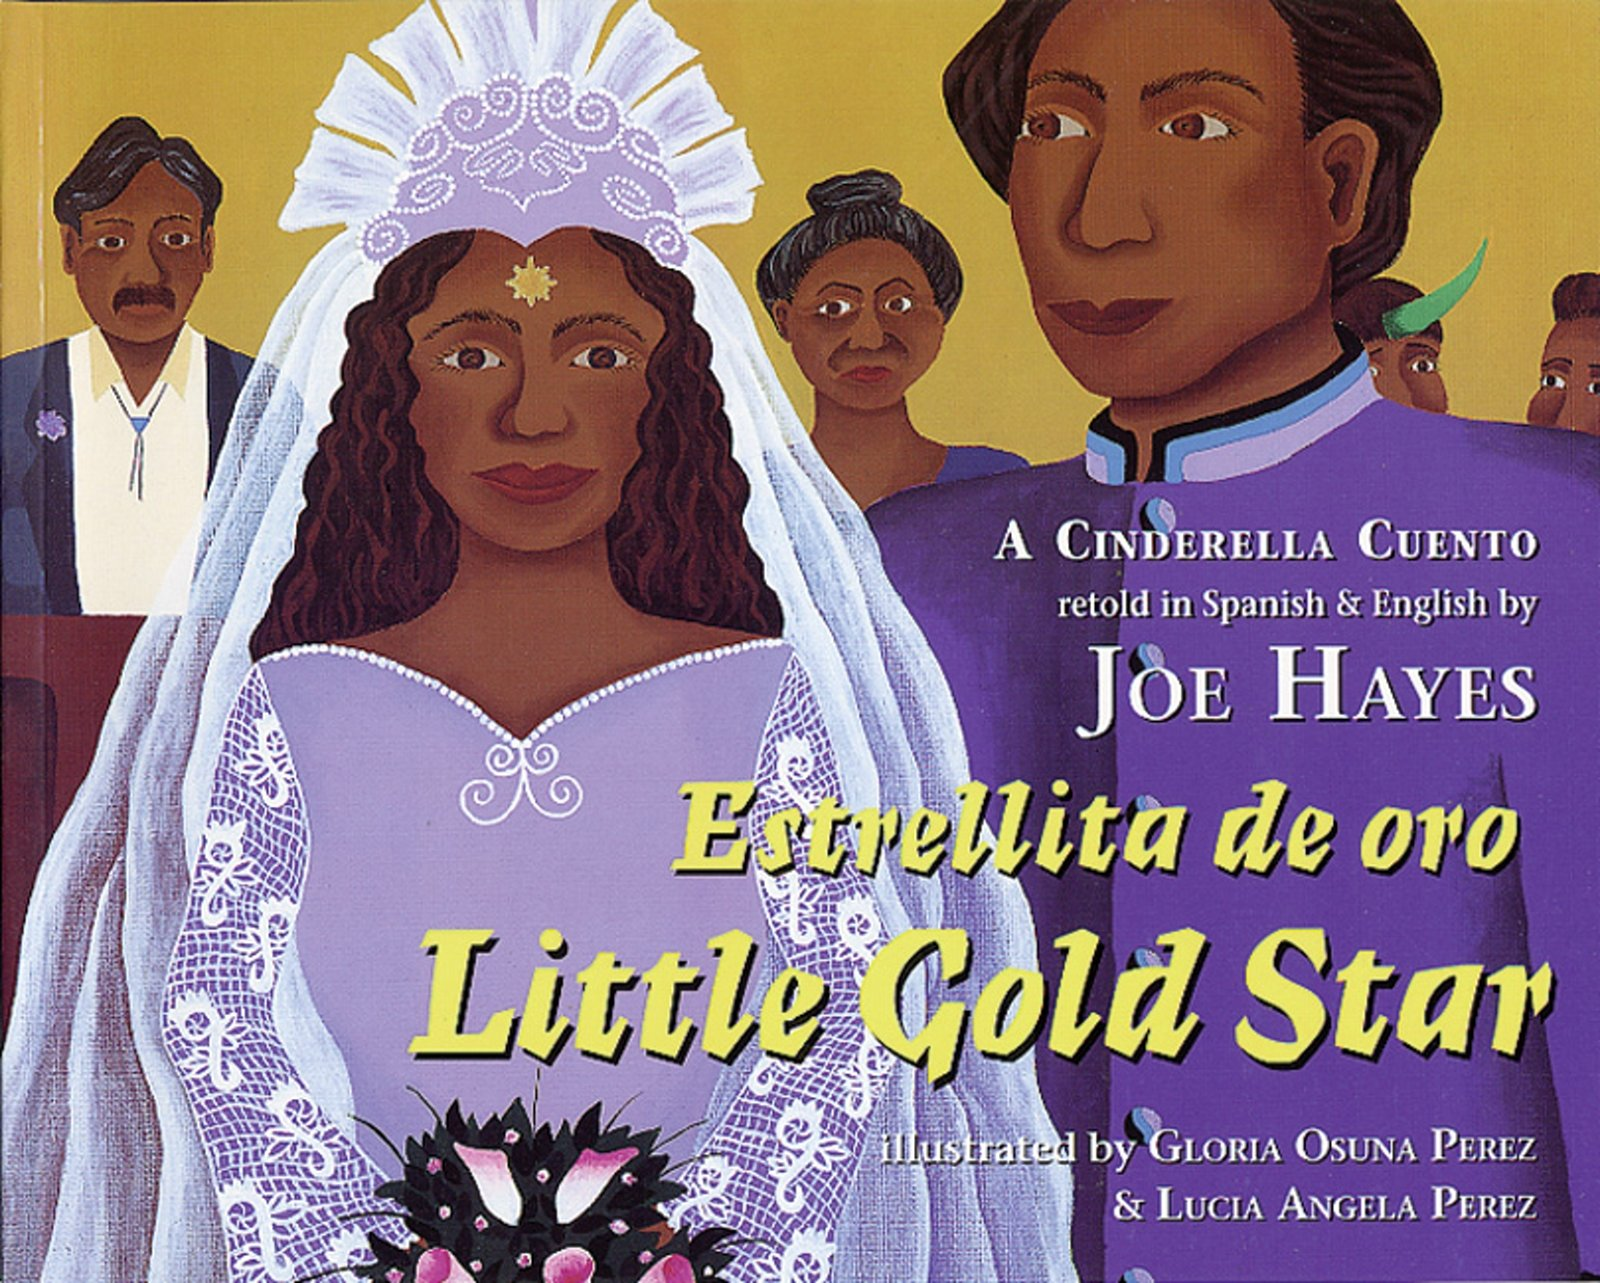 Estrellita de oro / Little Gold Star: A Cinderella Cuento by Brand: Cinco Puntos Press